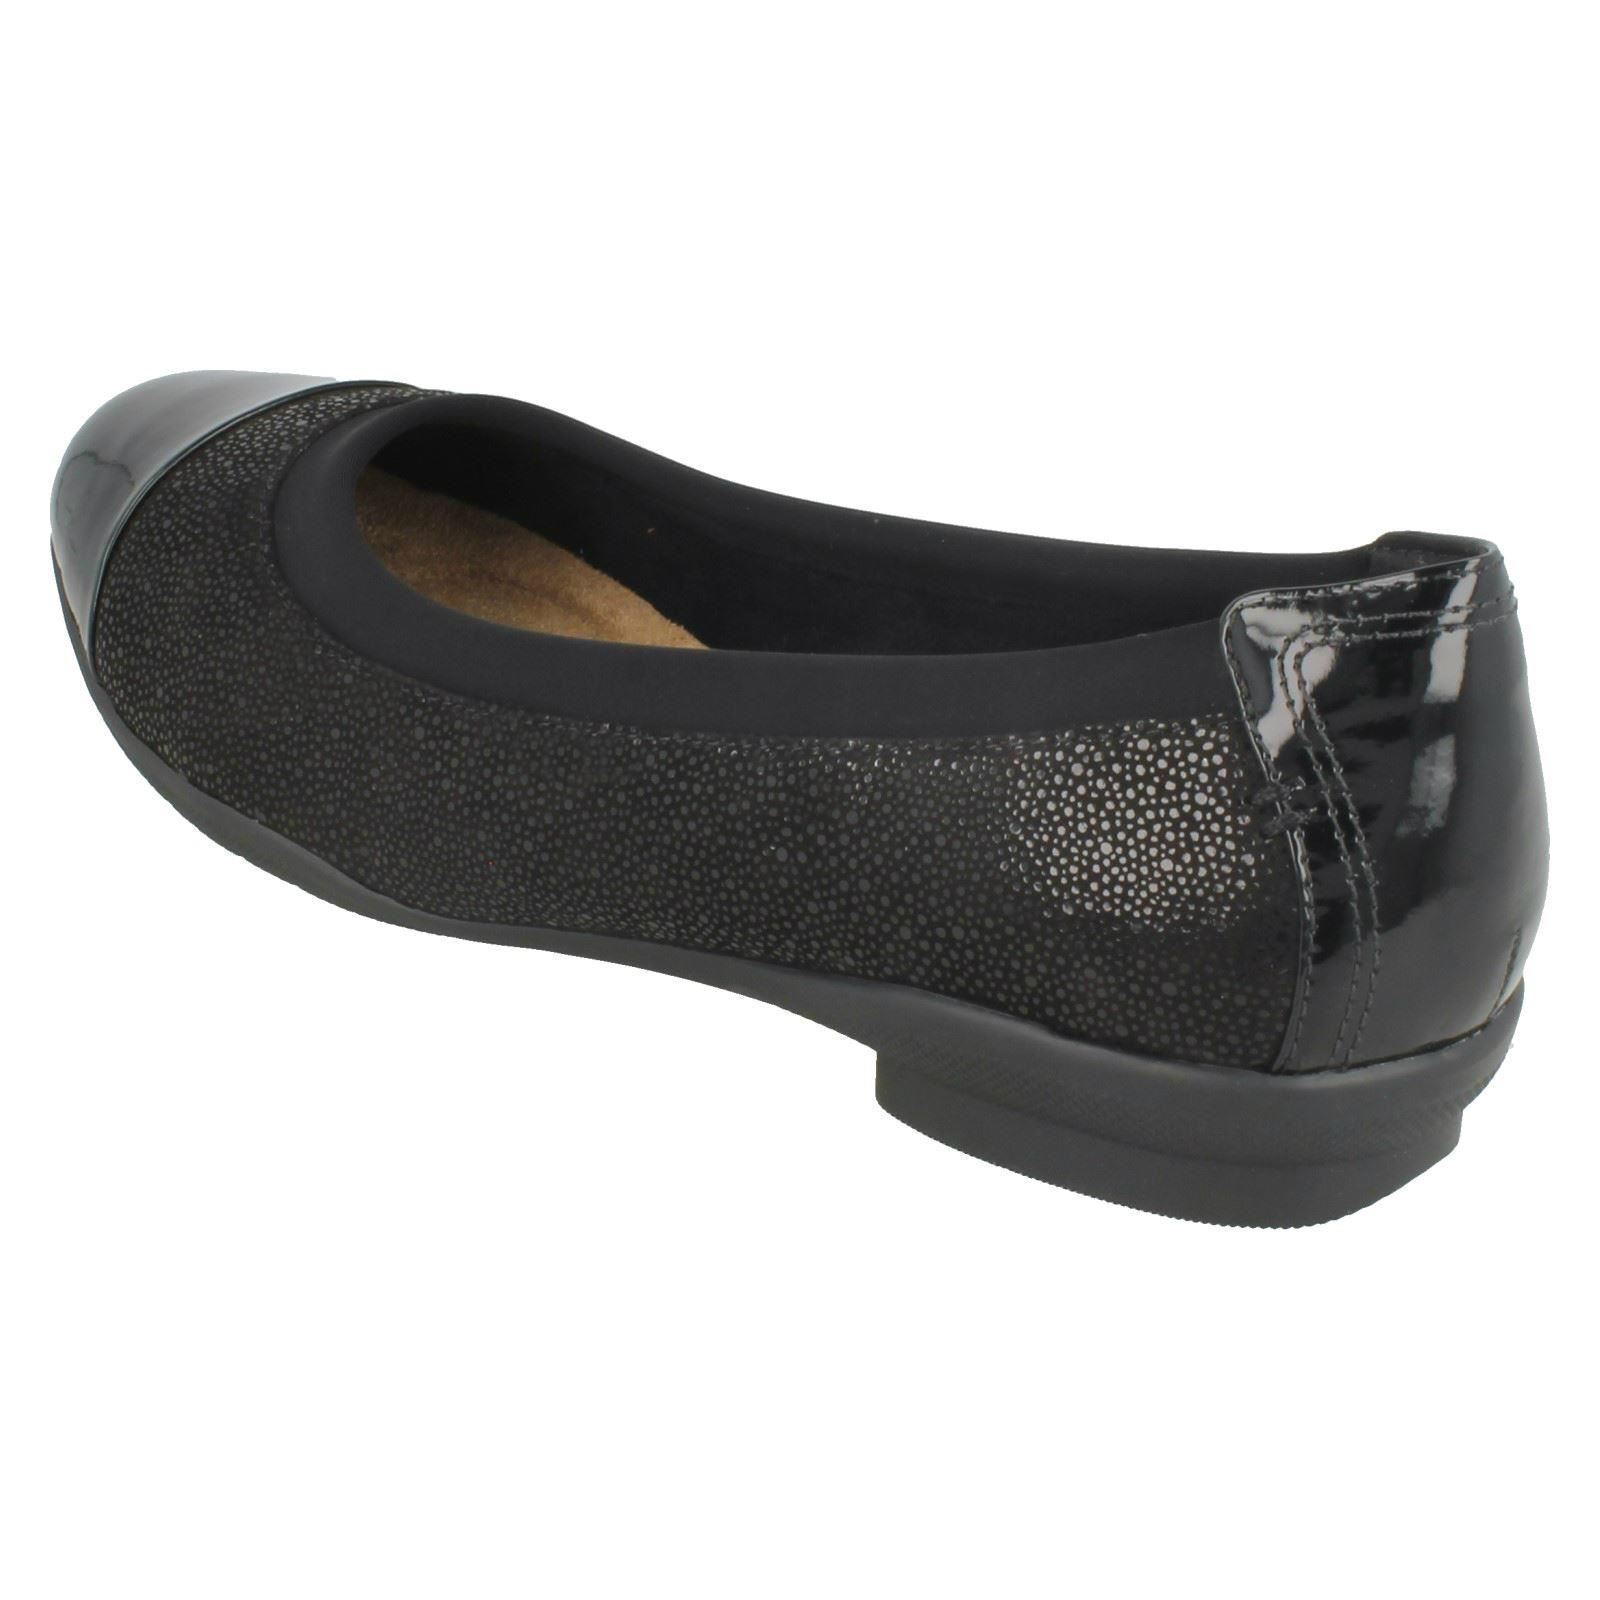 Mujer Clarks Nubuck Jardín Zapatos sin Cordones Neenah Jardín Nubuck Ajuste E 8caadc